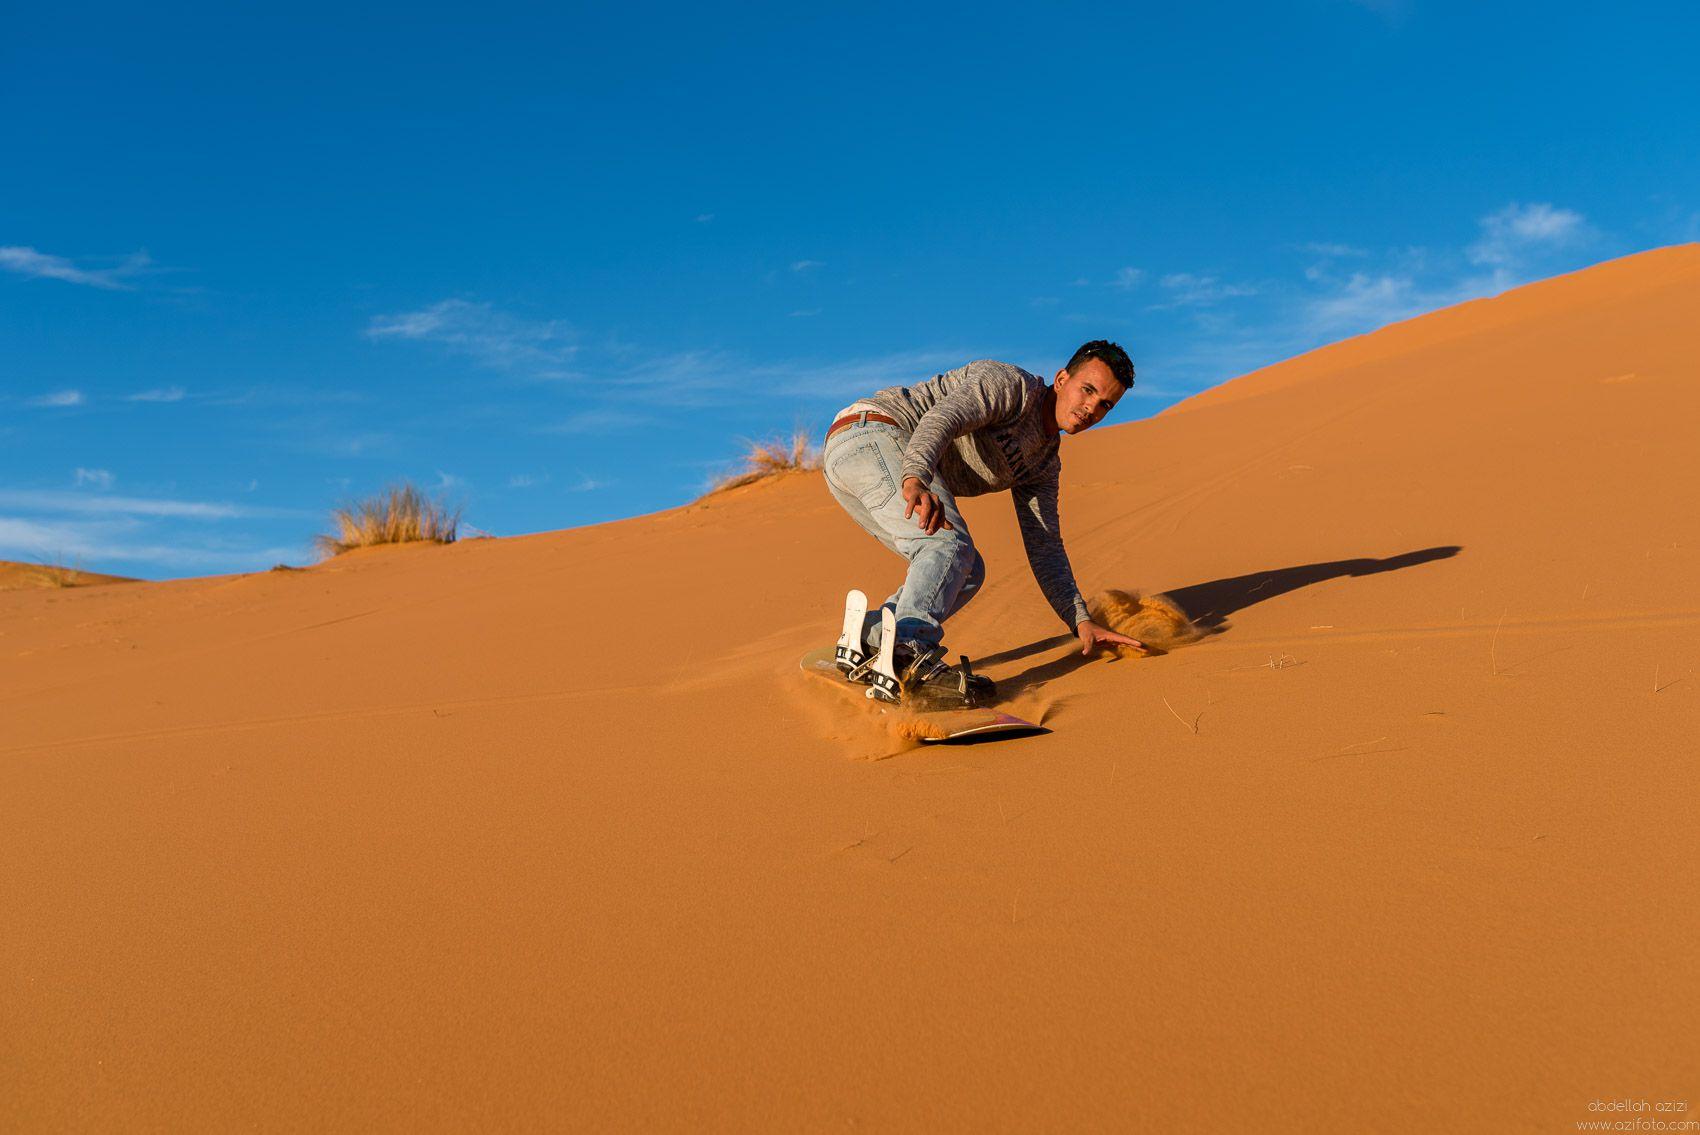 sand boarding in Morcco's desert